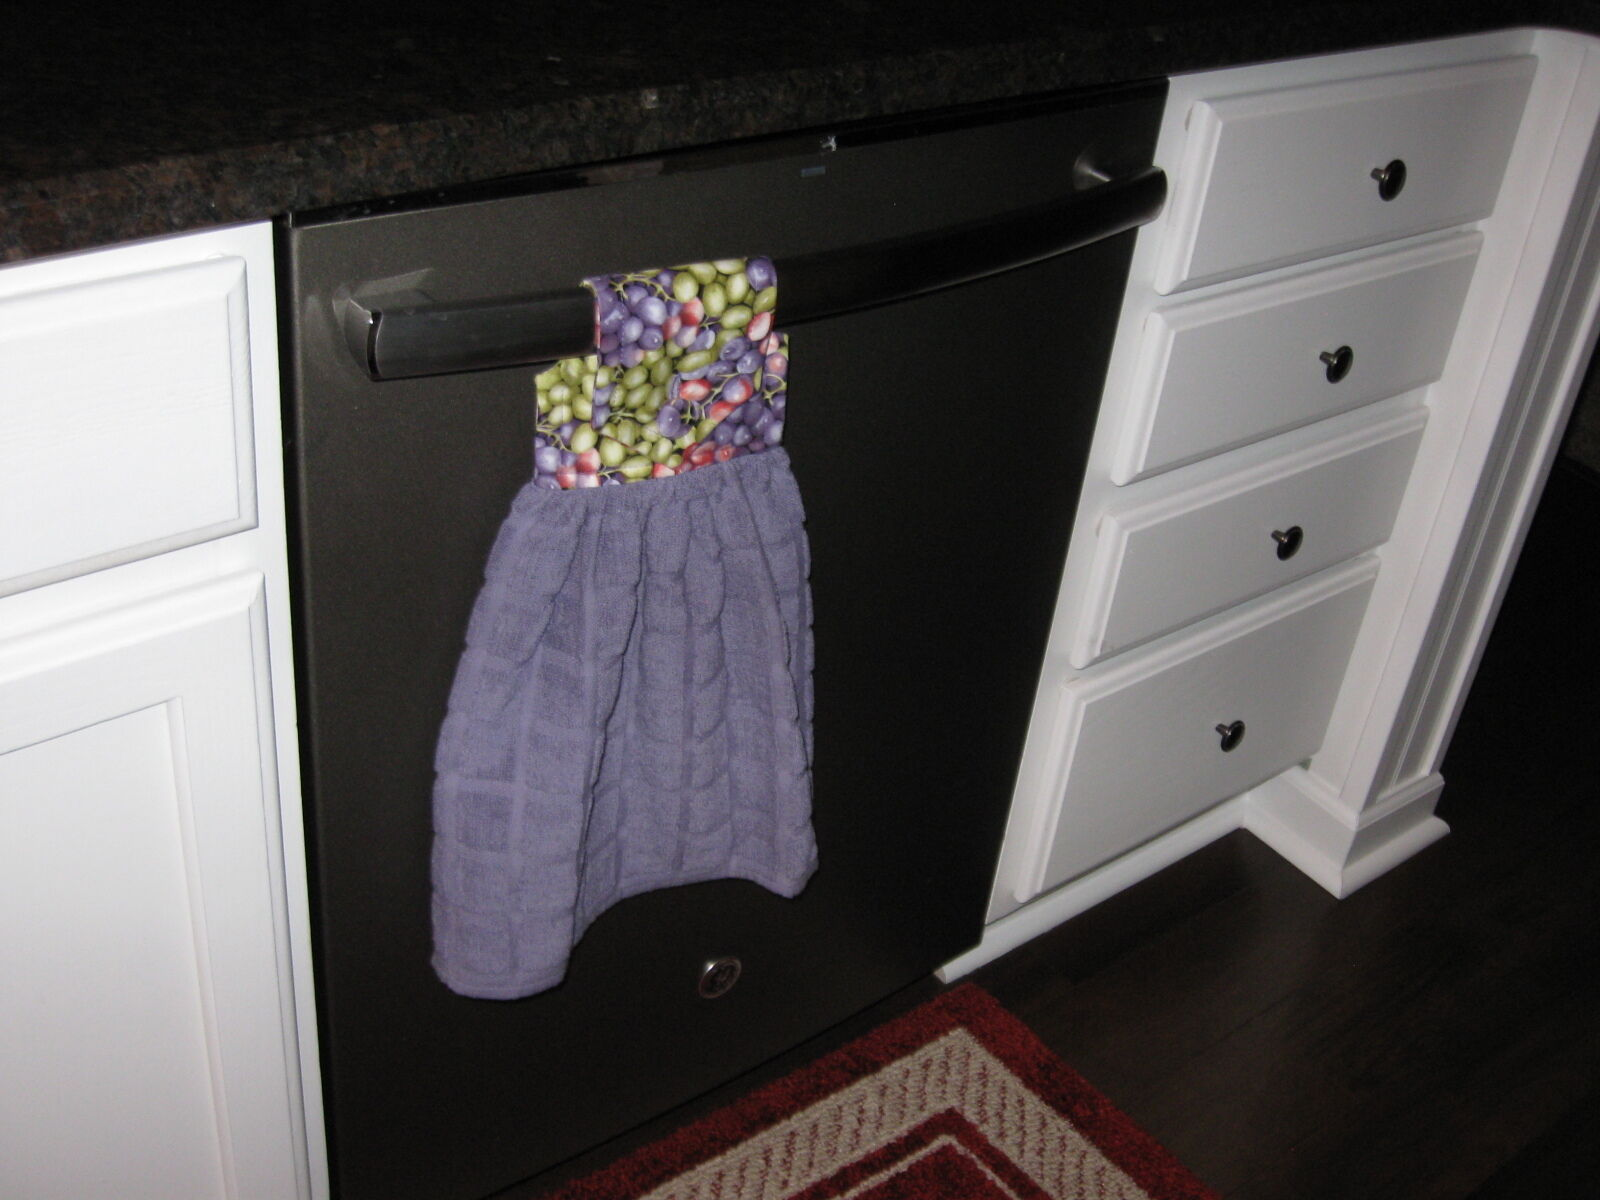 Handy Handmade Hand Towels By Debbi